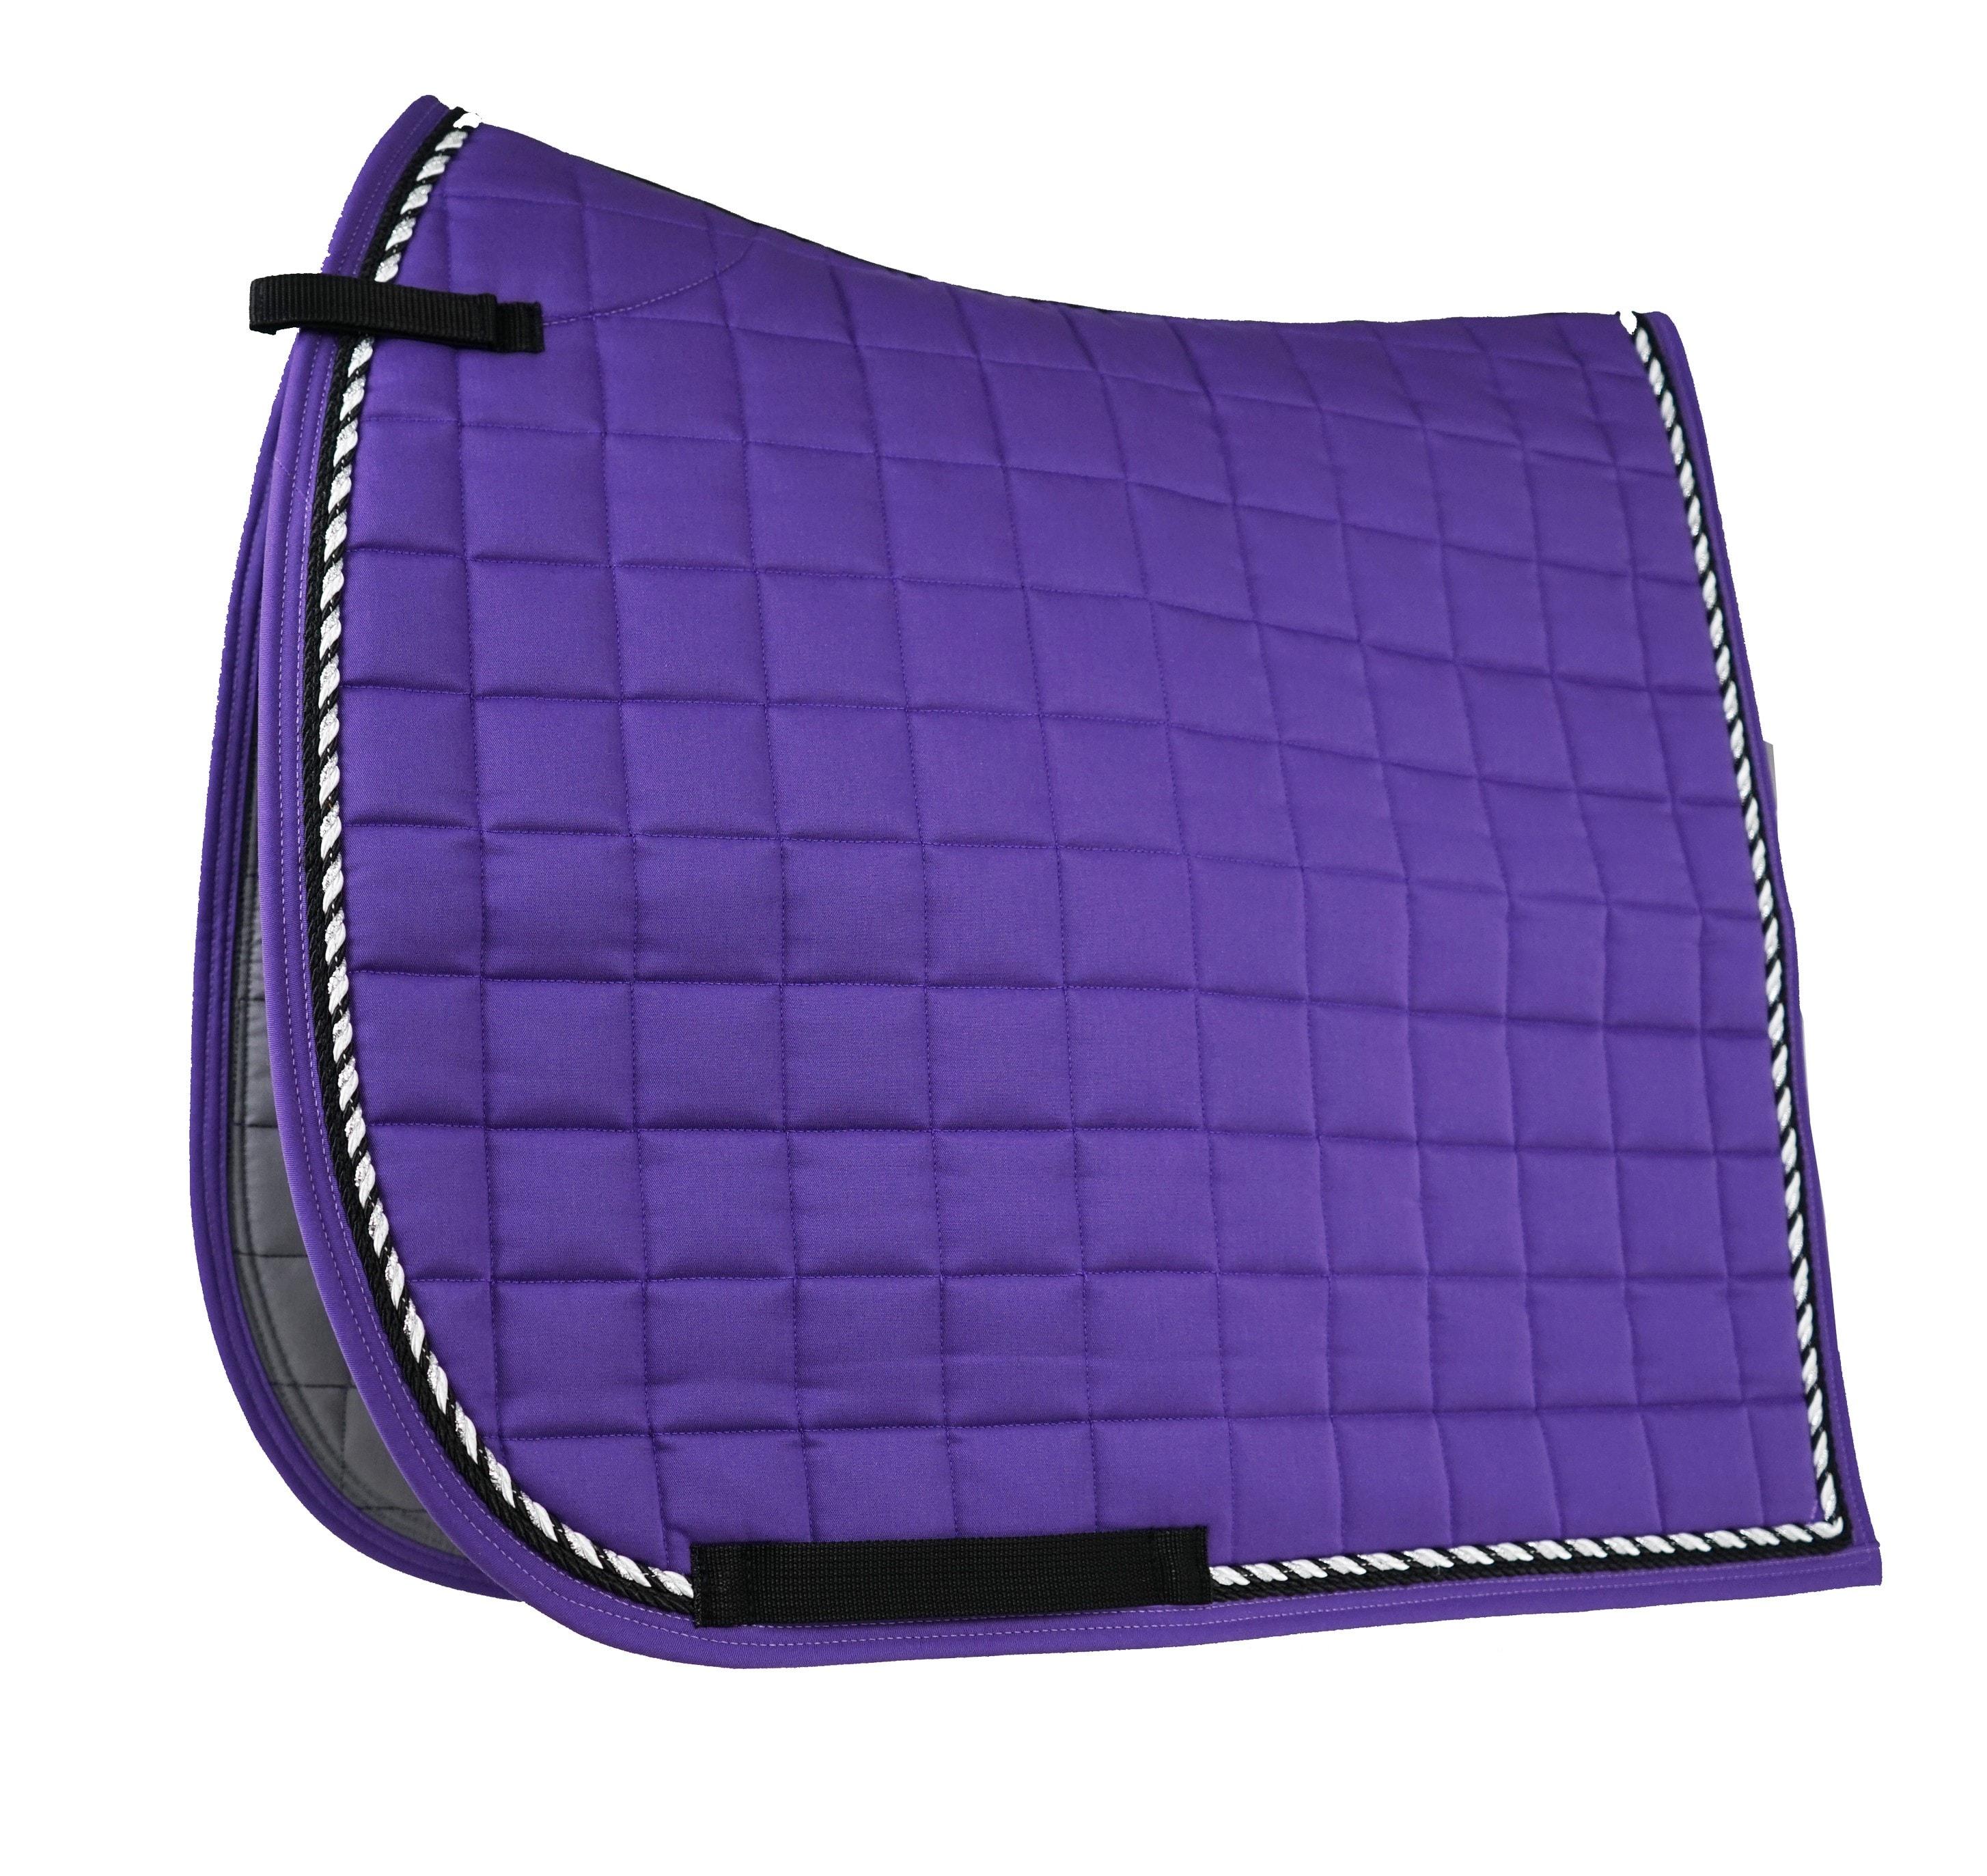 Dressage saddle pad - Purple/Black/Silver